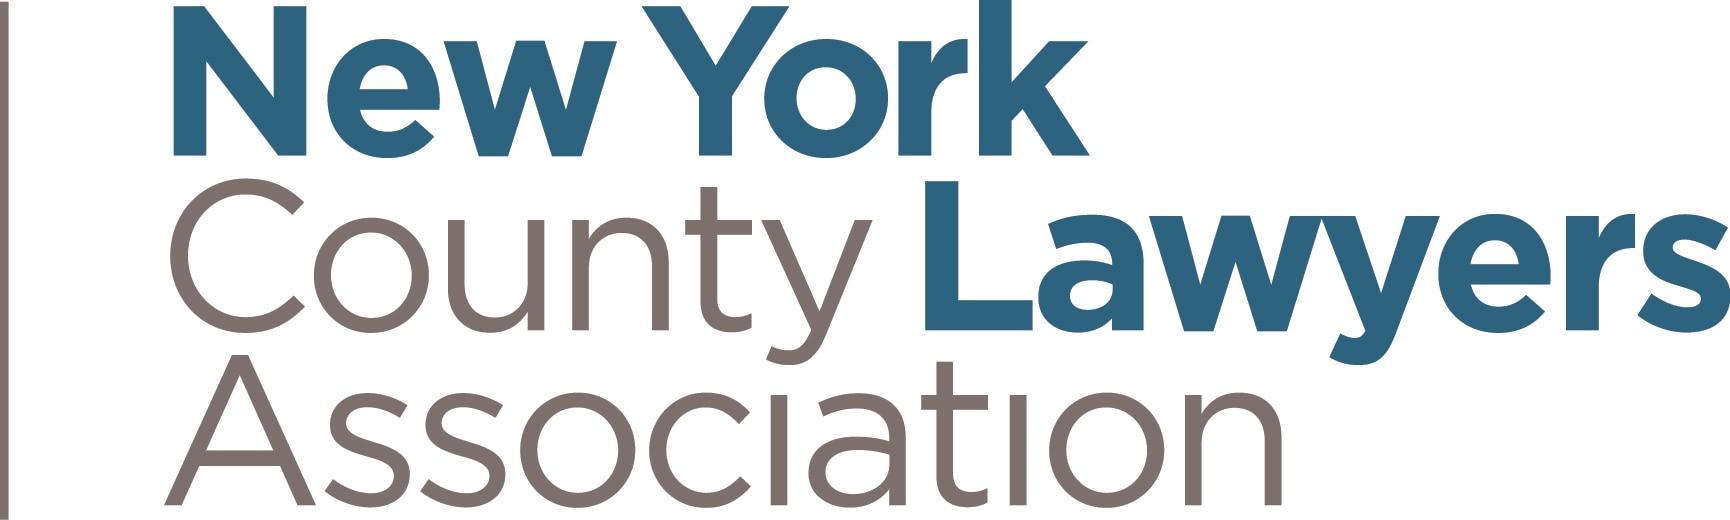 New York County Lawyers Association to Establish  New Headquarters at 28 Liberty Street